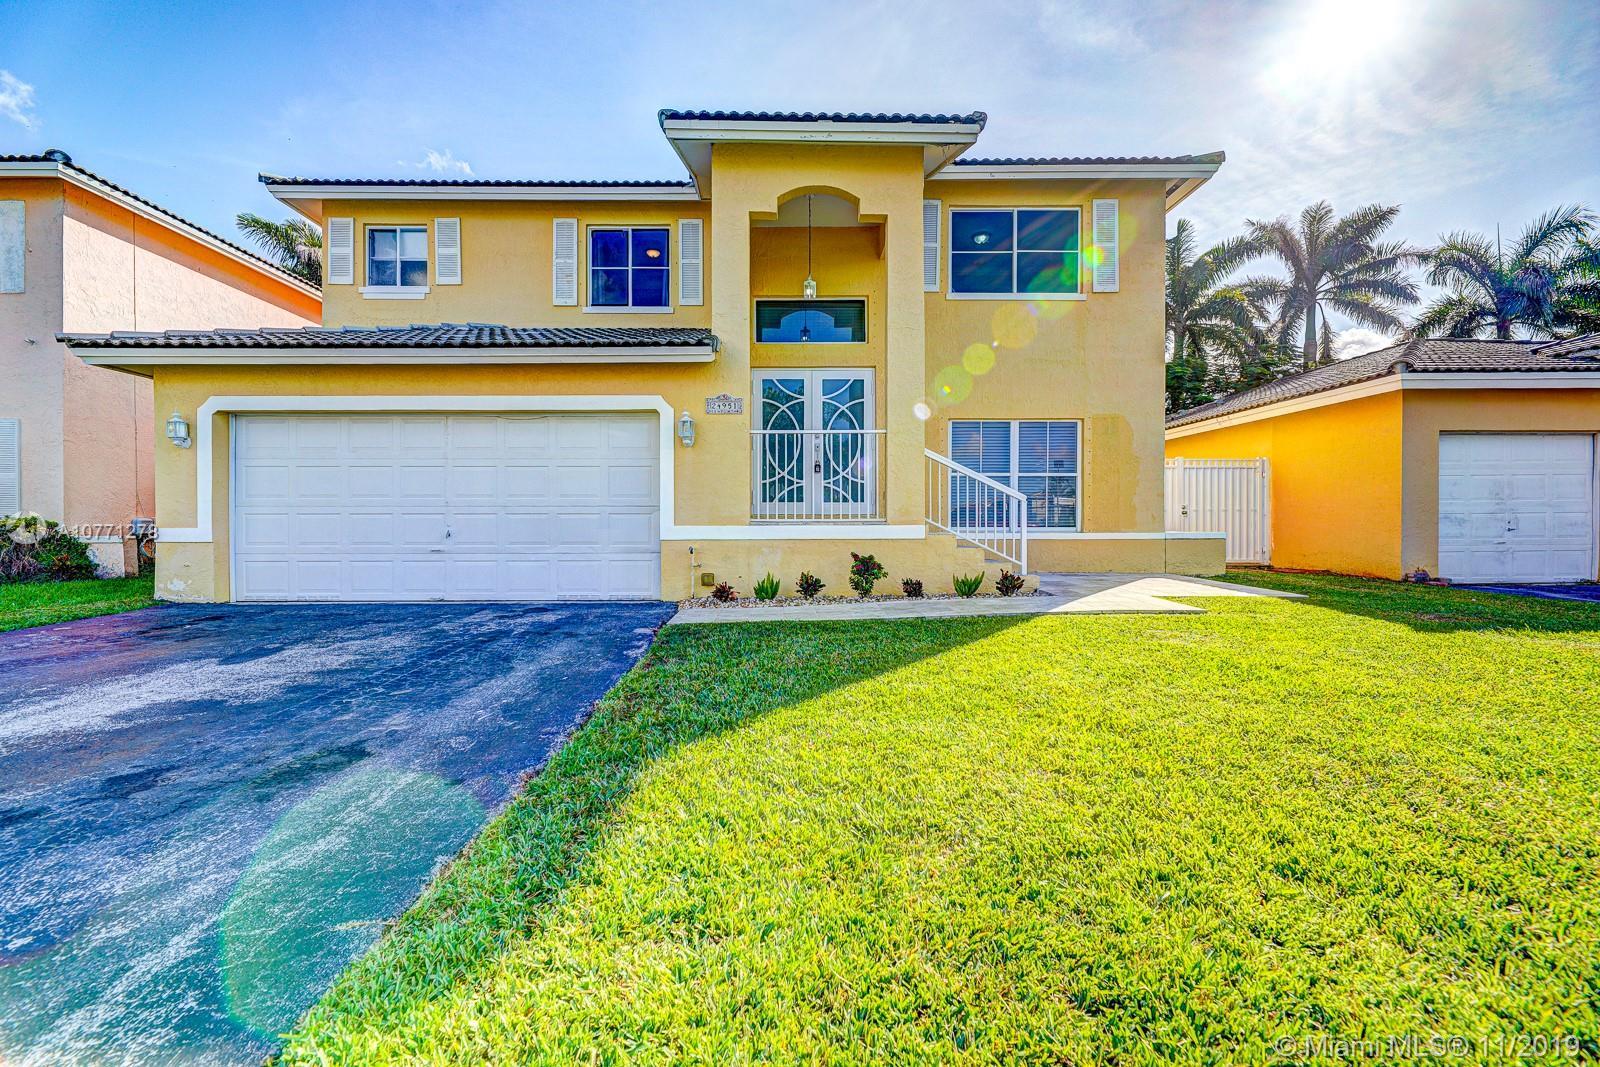 24951 SW 120TH PL, Homestead, FL 33032 - Homestead, FL real estate listing